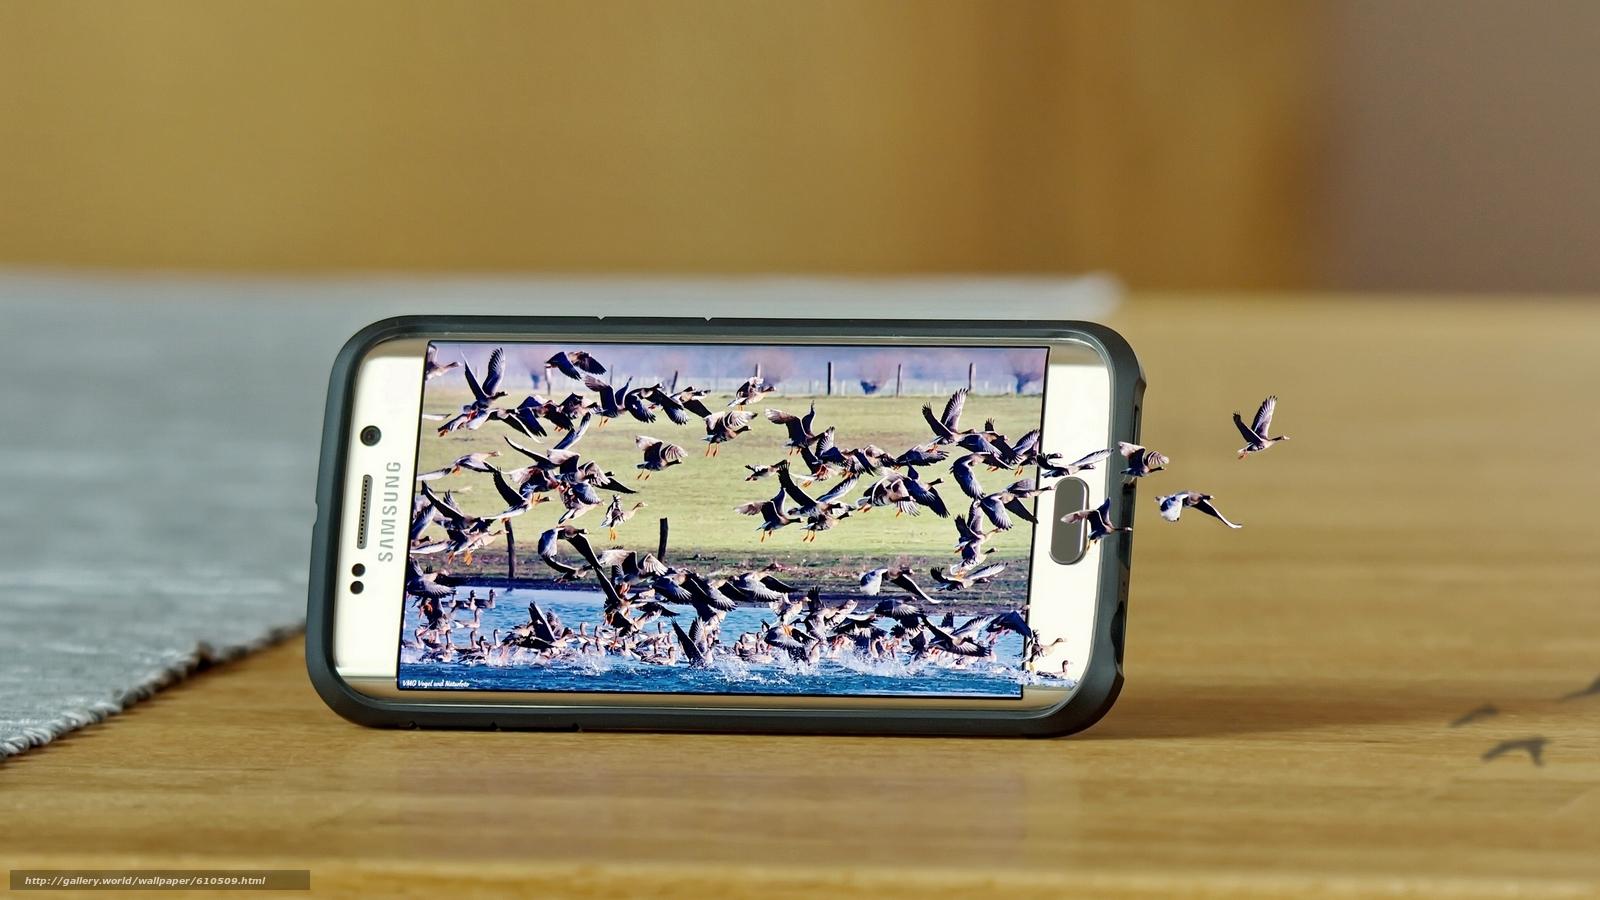 Tlcharger fond d 39 ecran samsung galaxy s6 bord samsung for Fond ecran smartphone